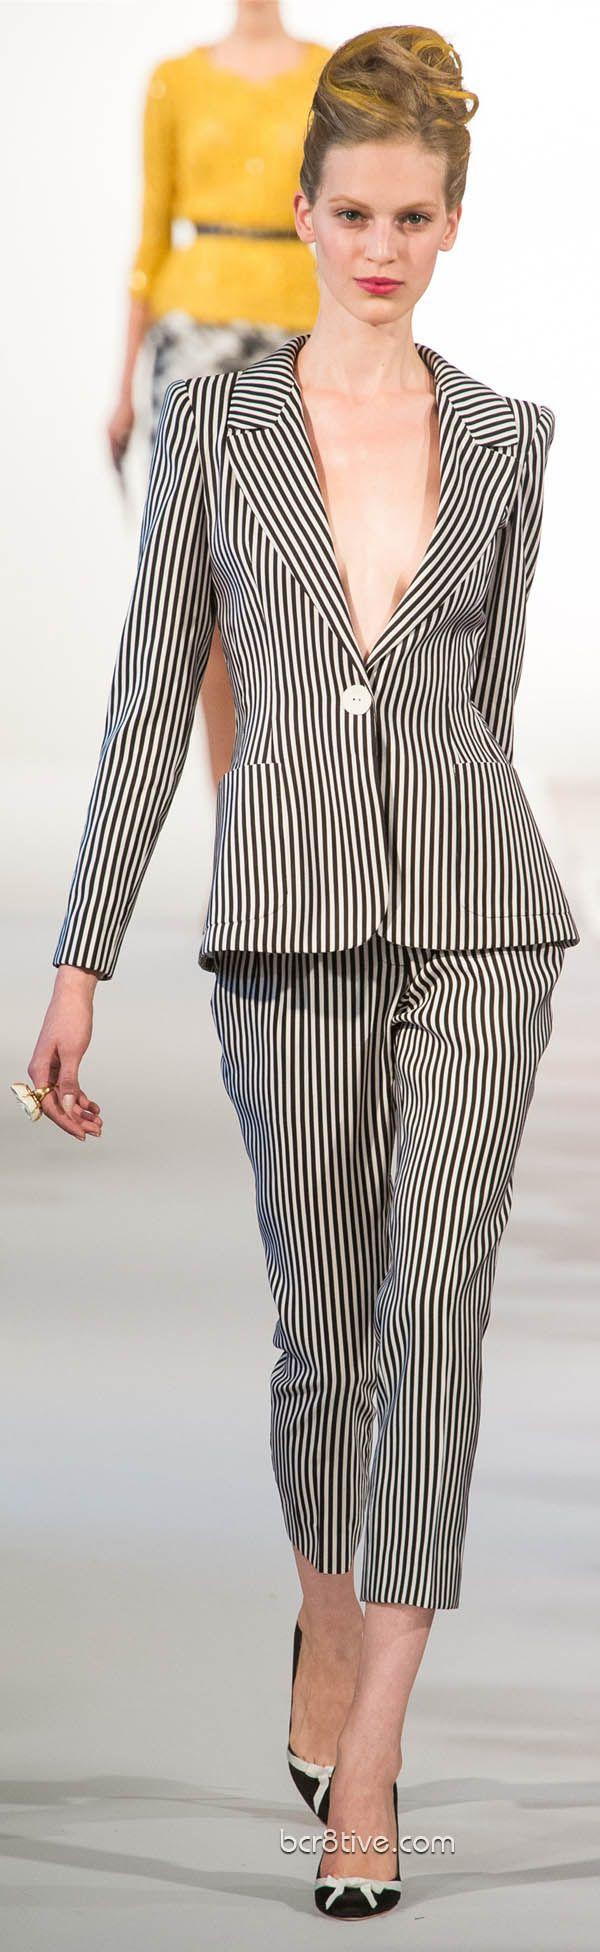 101 best images about women in suits on pinterest ralph for Oscar de la renta candles